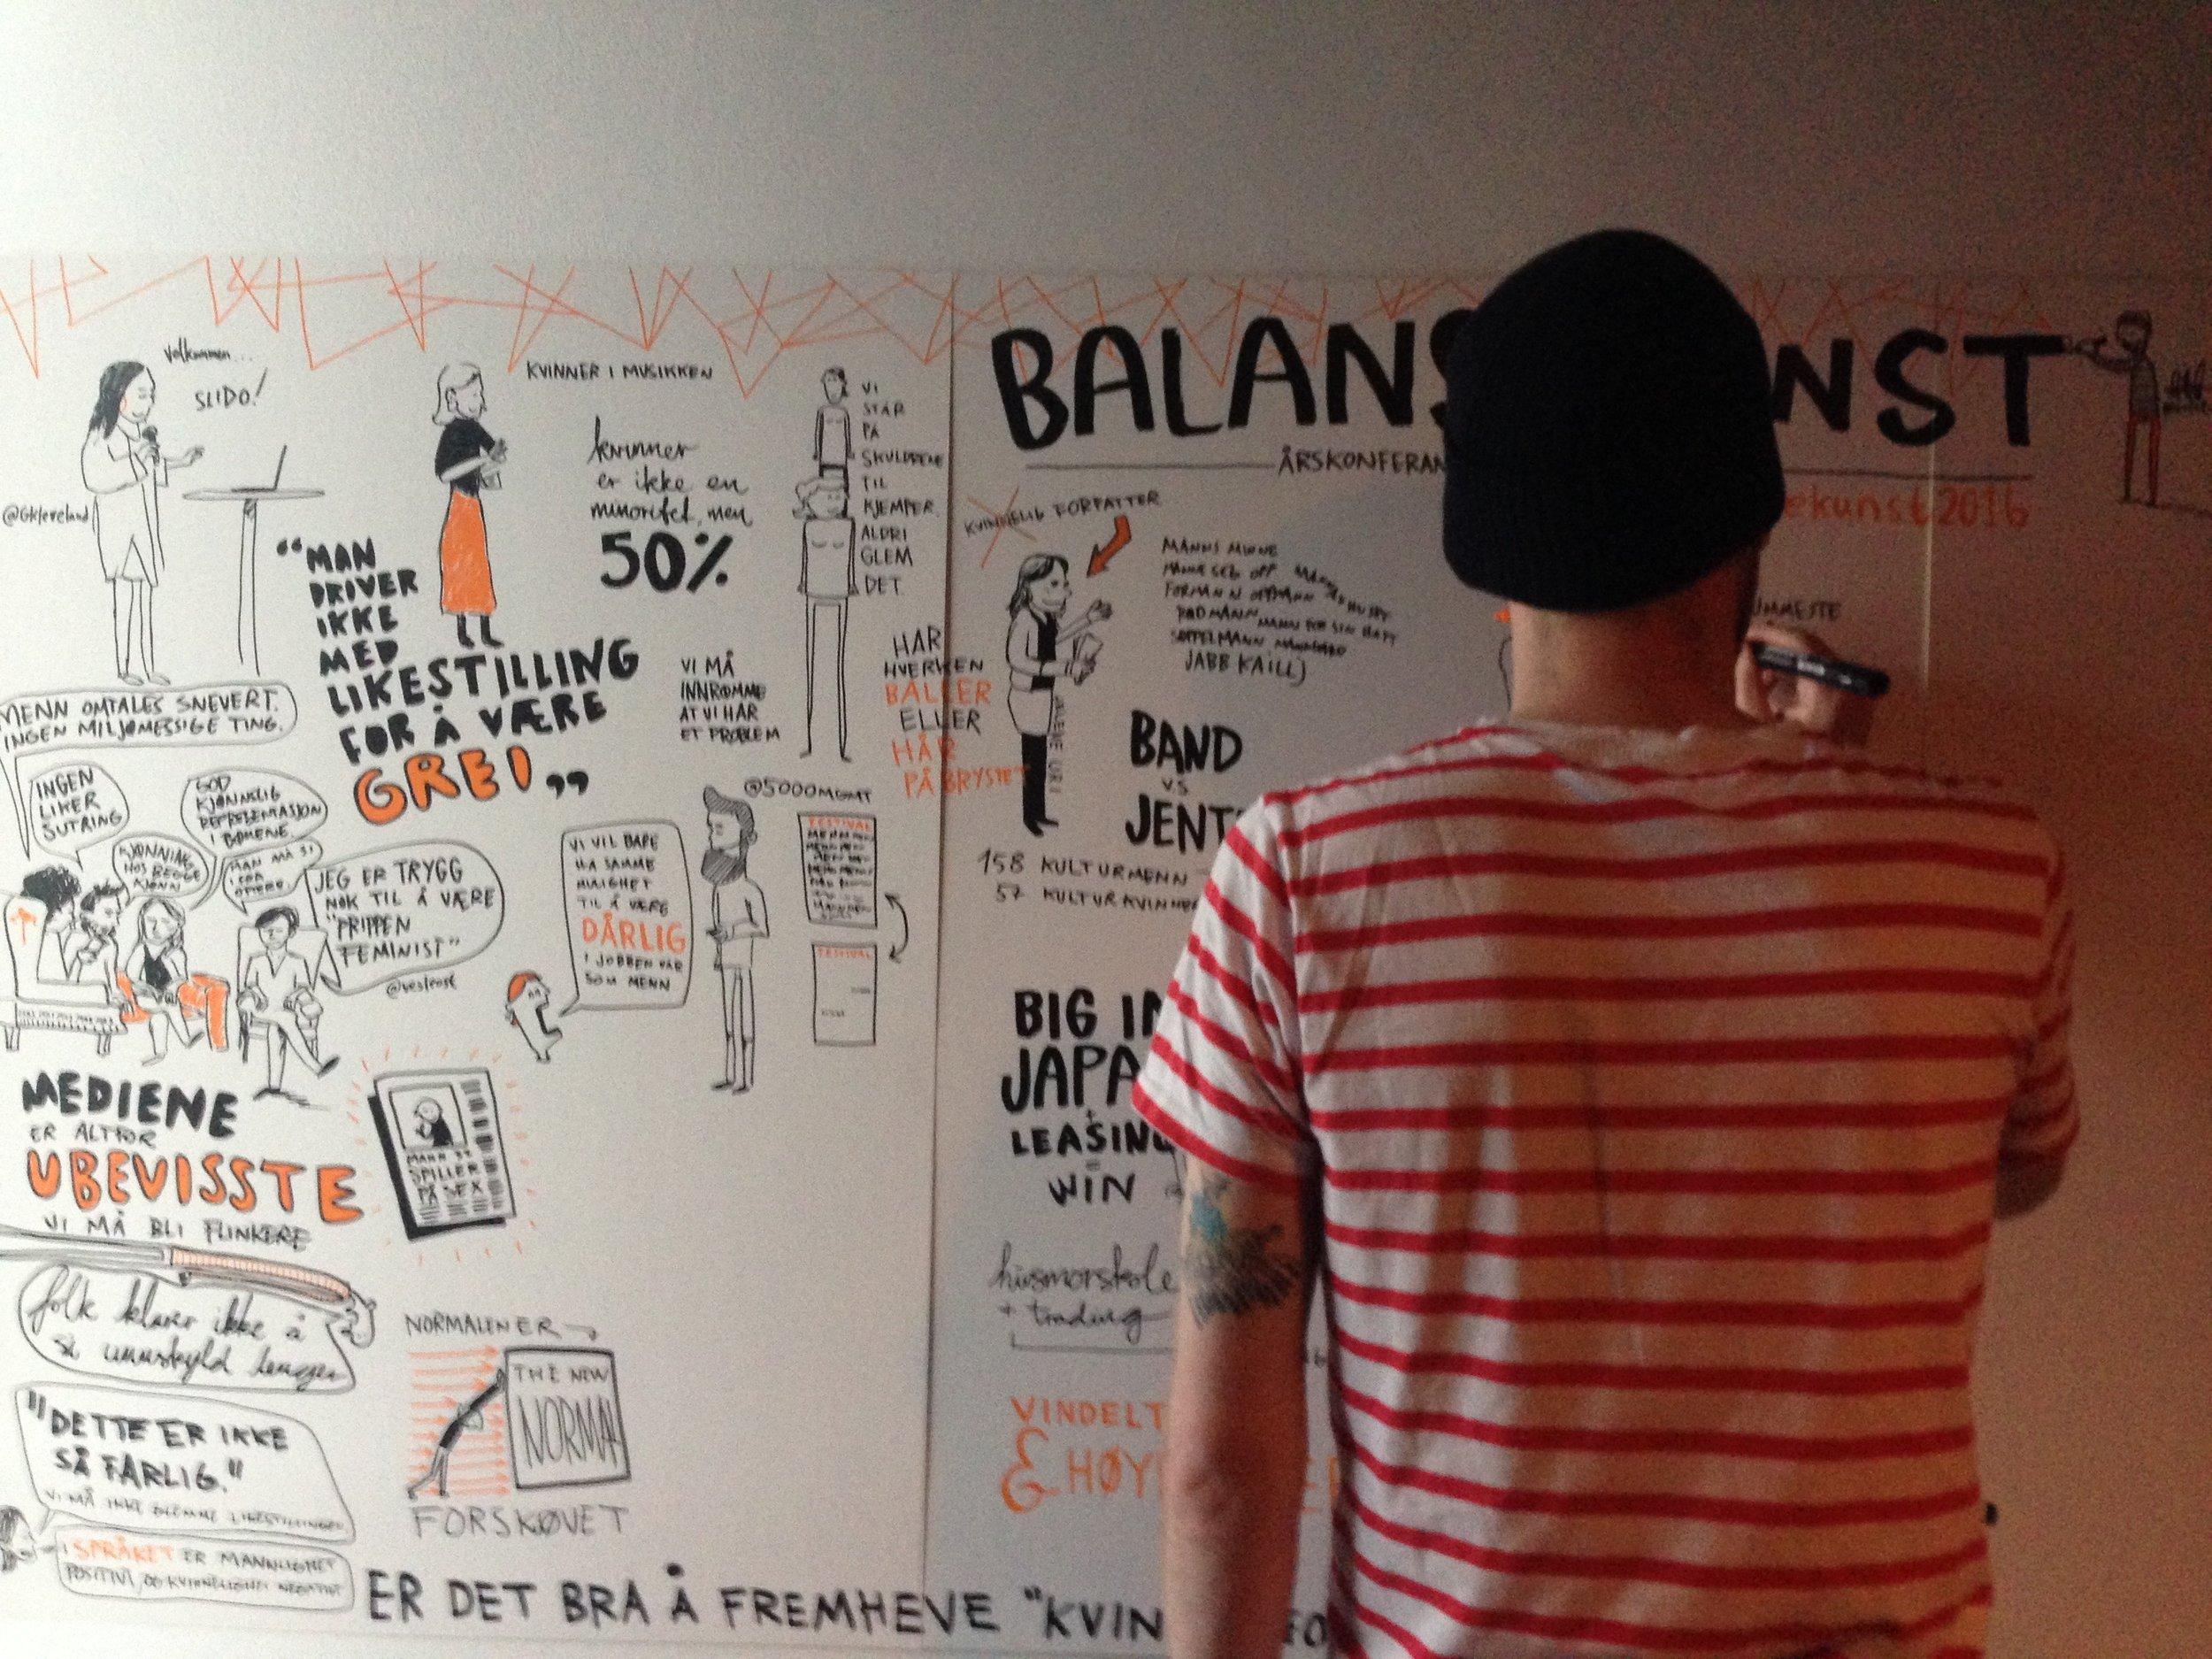 Tegner Ståle Gerhardsen førte referat fra hele konferansen – via tusj!Foto: Balansekunst